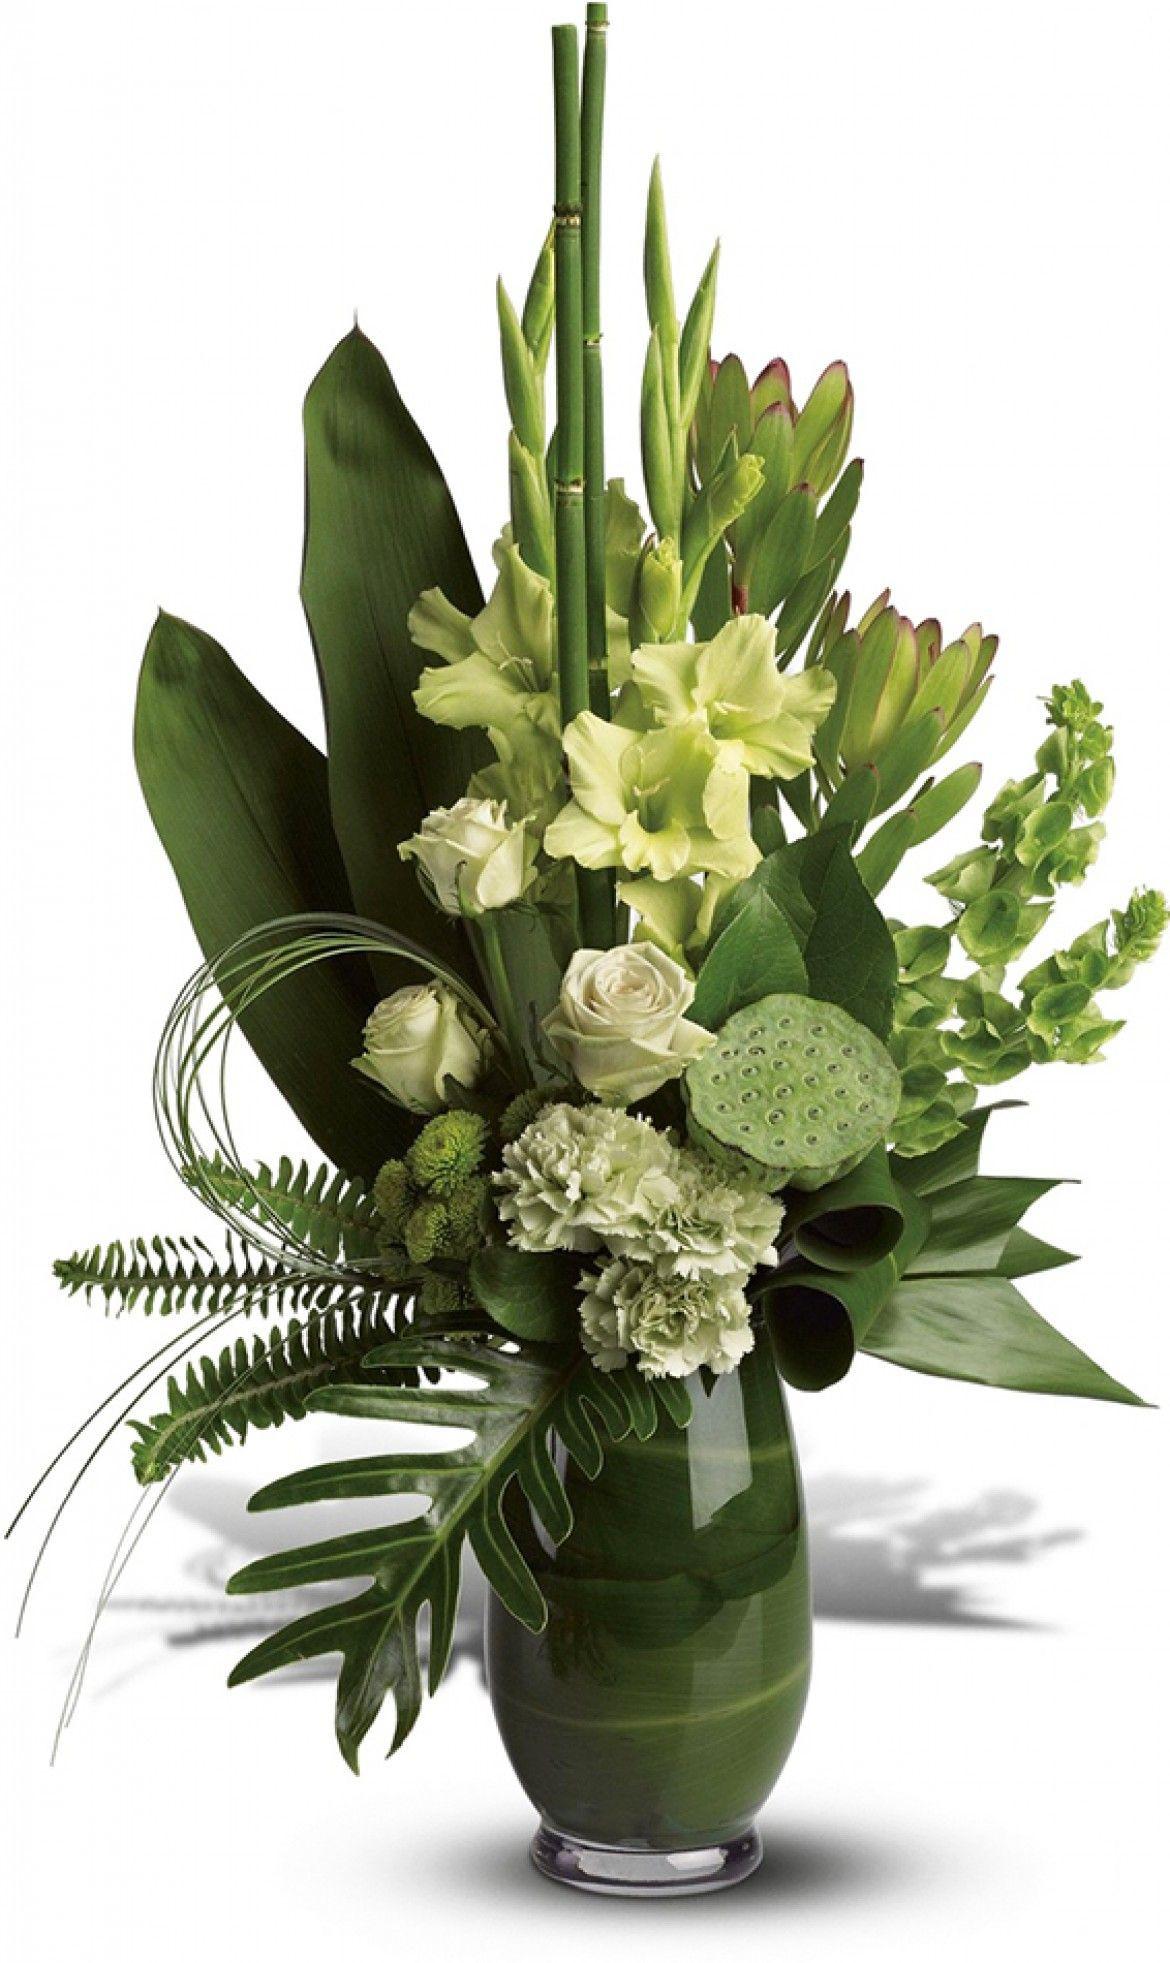 25 Stylish Tall Floor Vase Flower Arrangements Decorative Vase Ideas